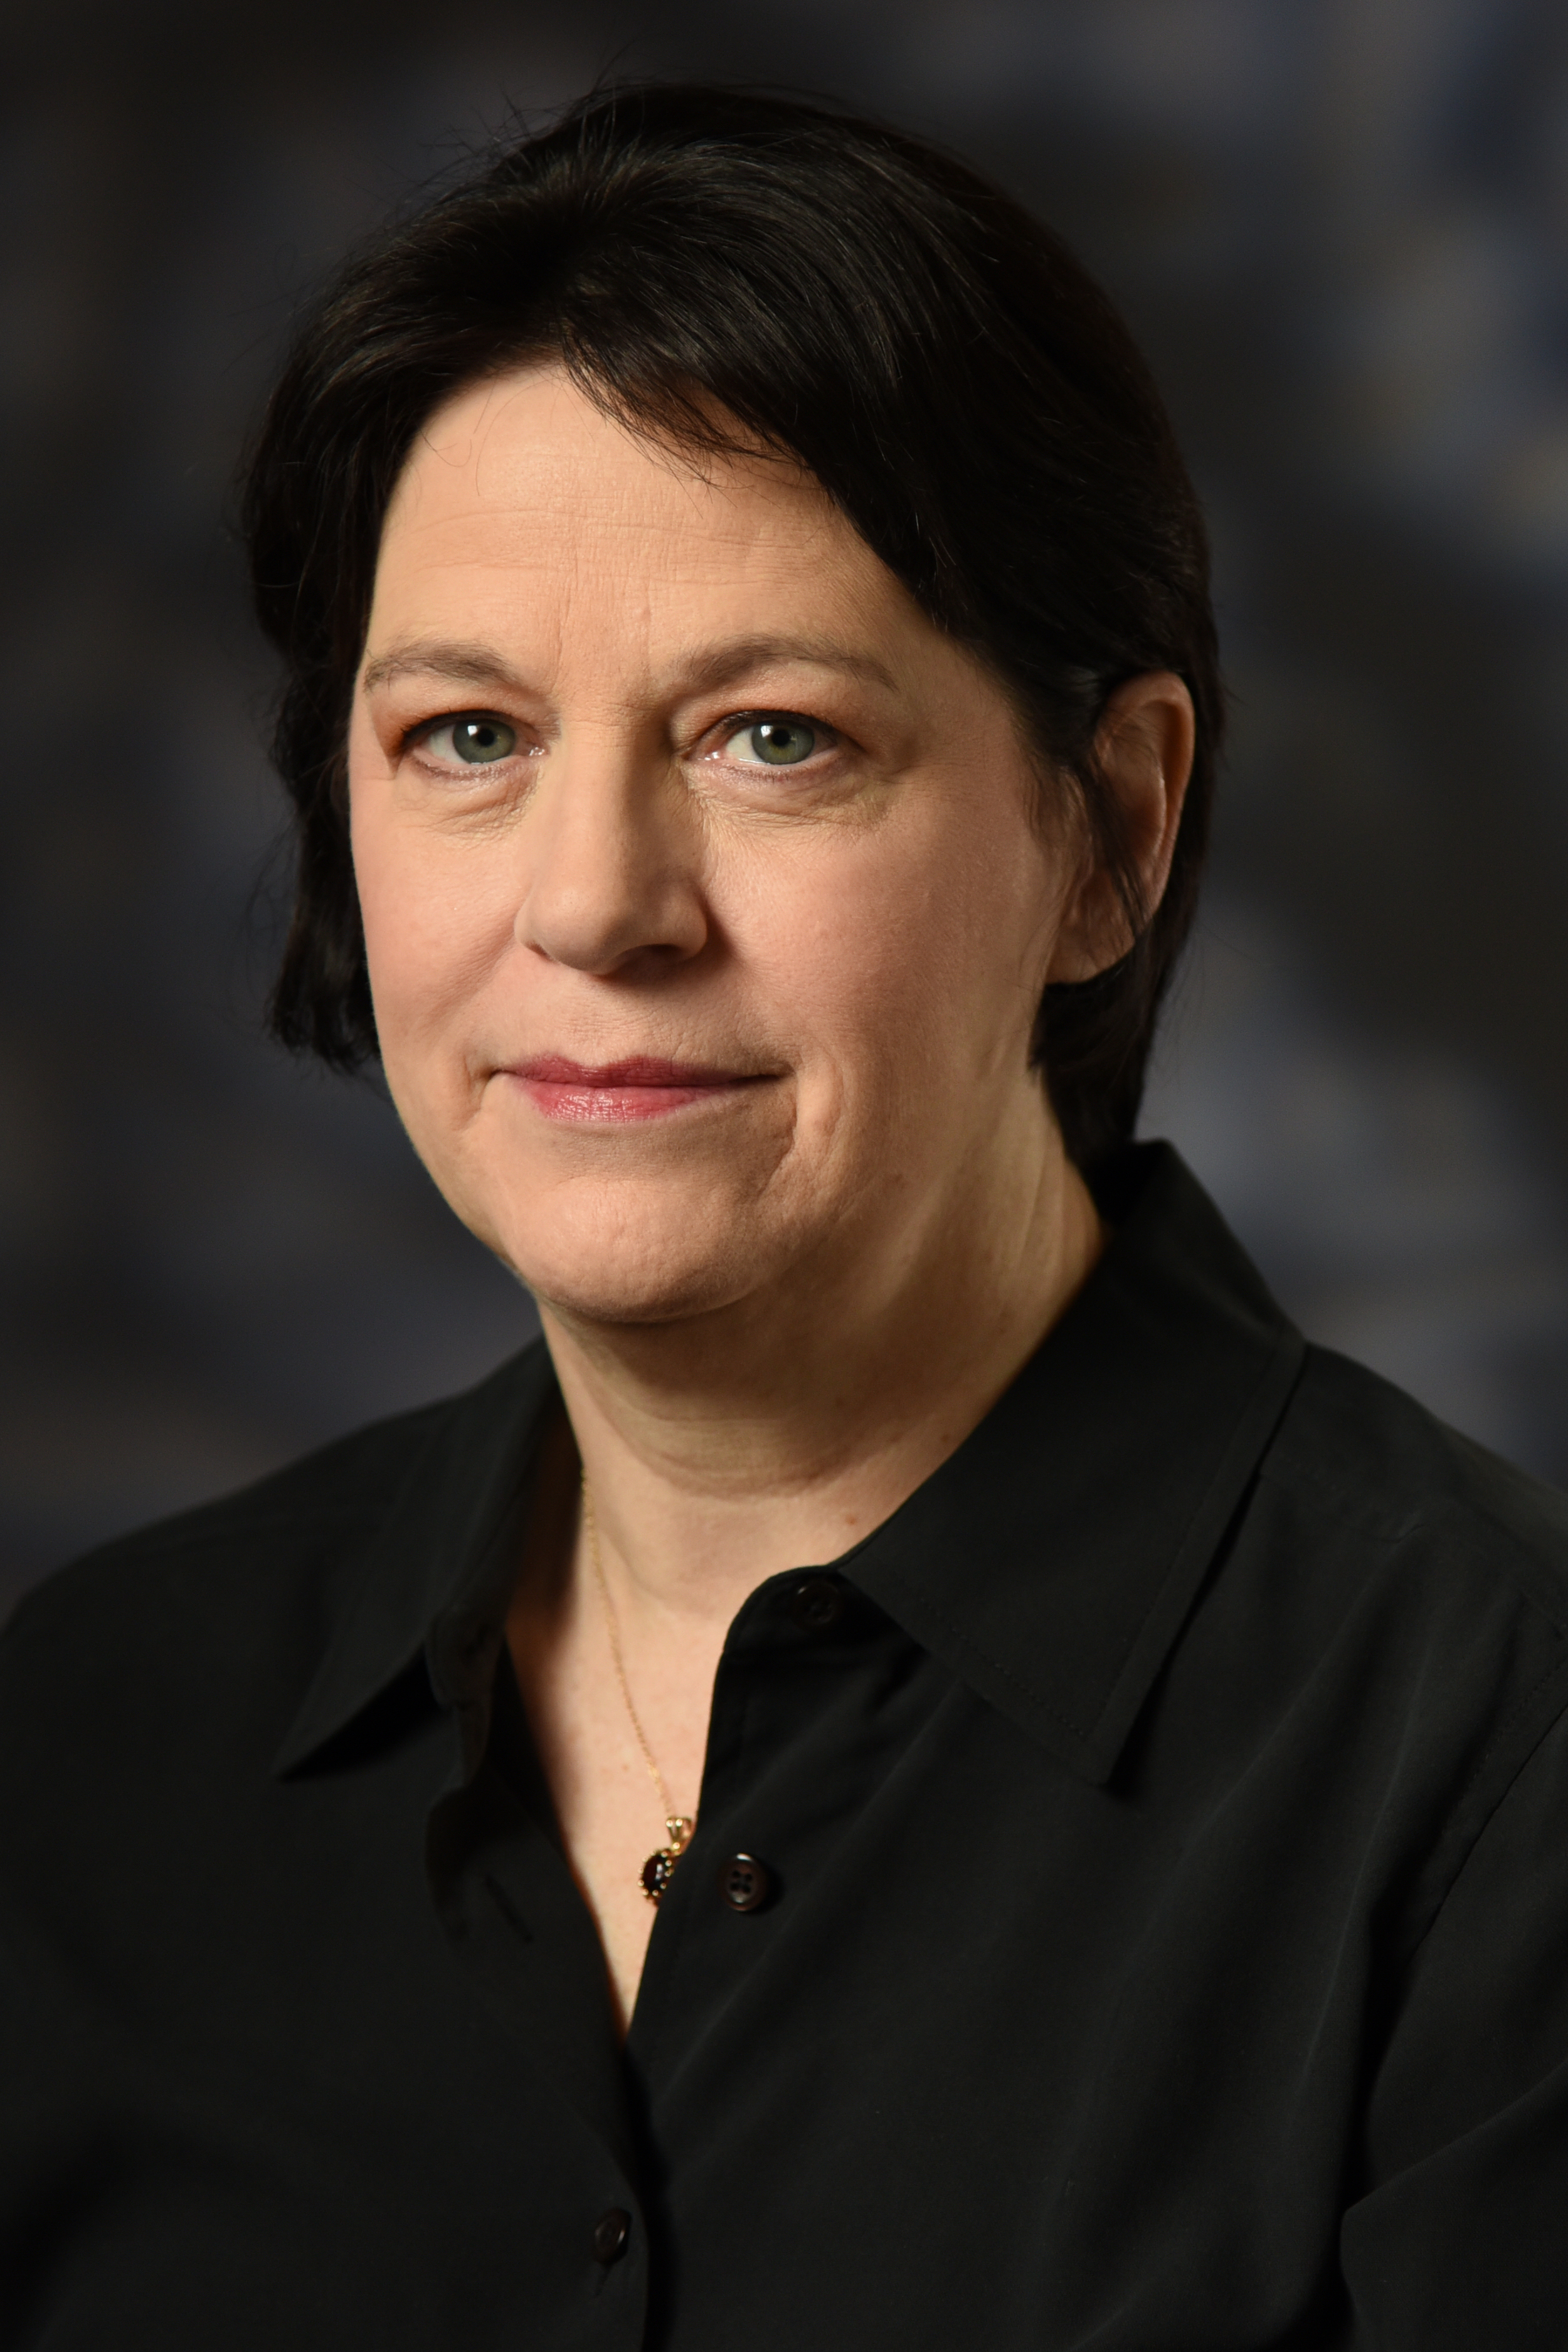 Dr. Kathryn E. Holland Braund Auburn University William Bartram